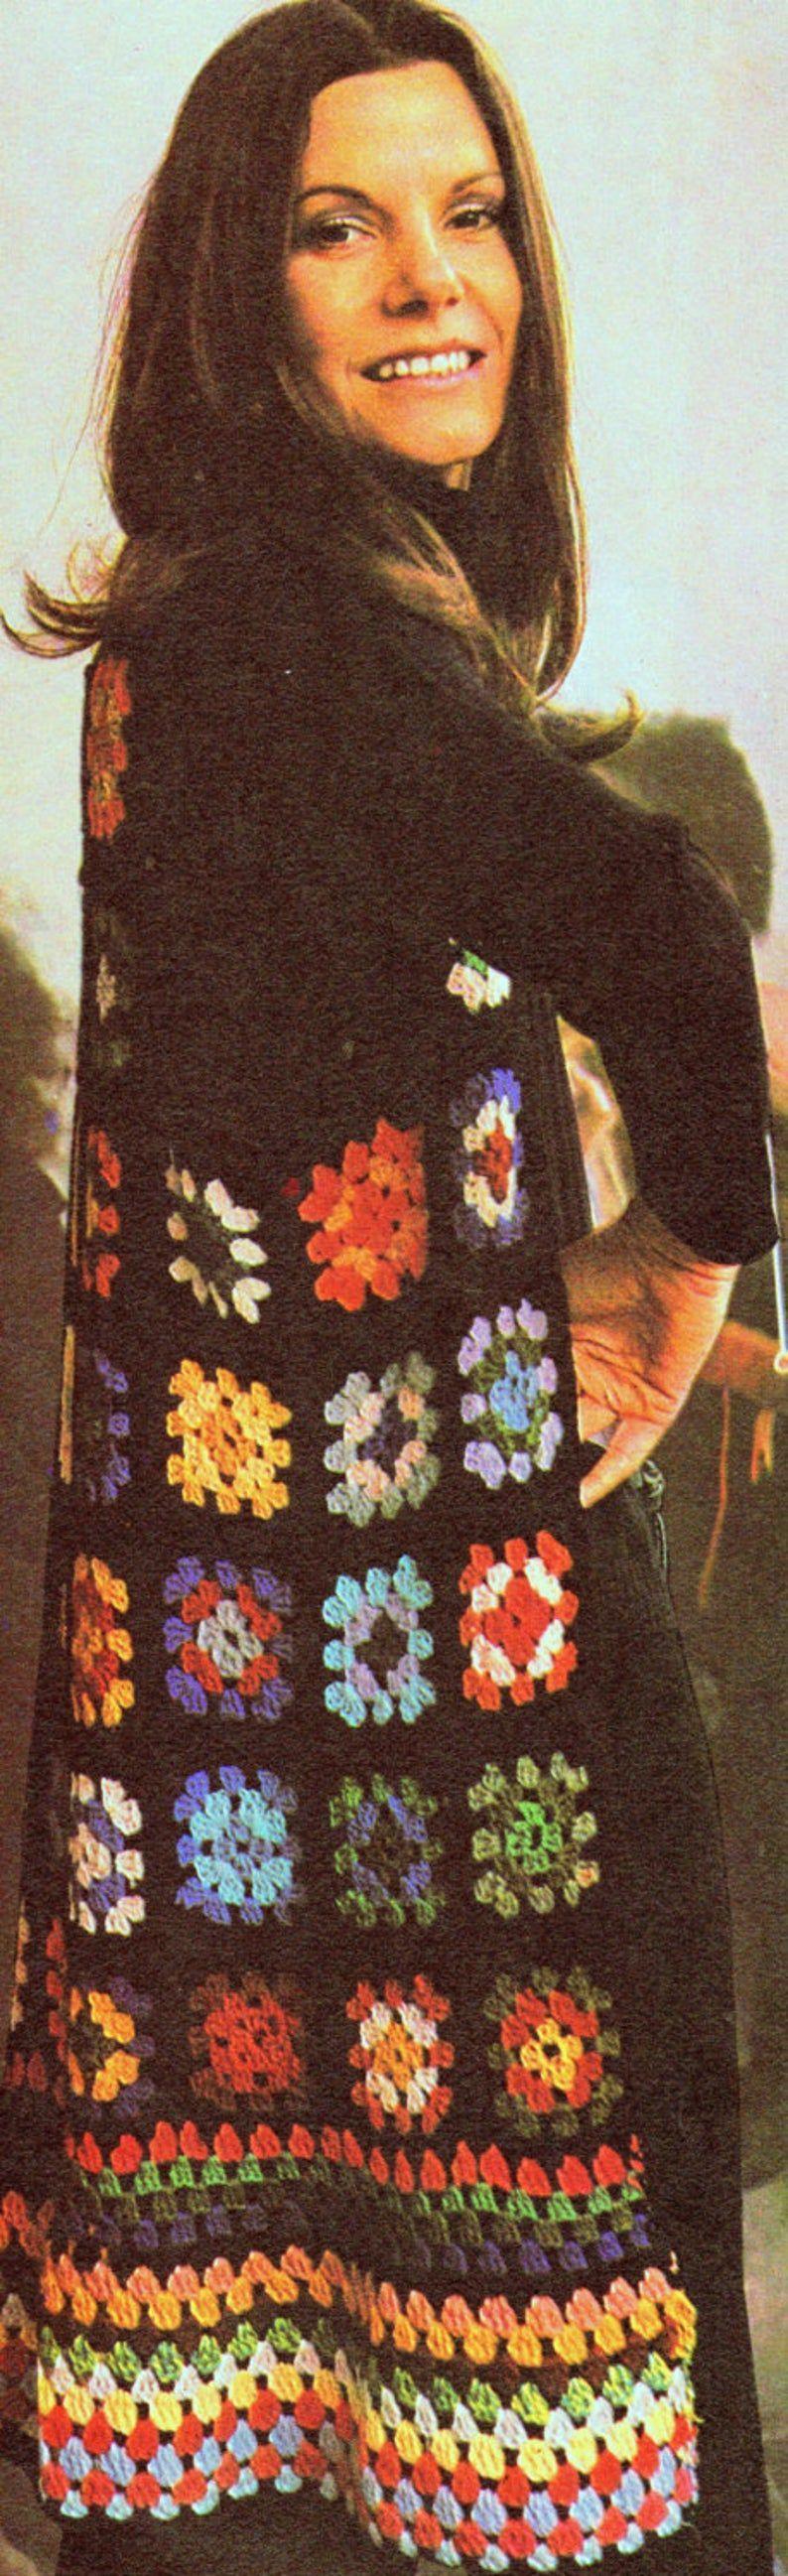 Photo of CROCHET PATTERN Long Waistcoat in Granny Squares Tunic   Etsy #häkelanleitungen…